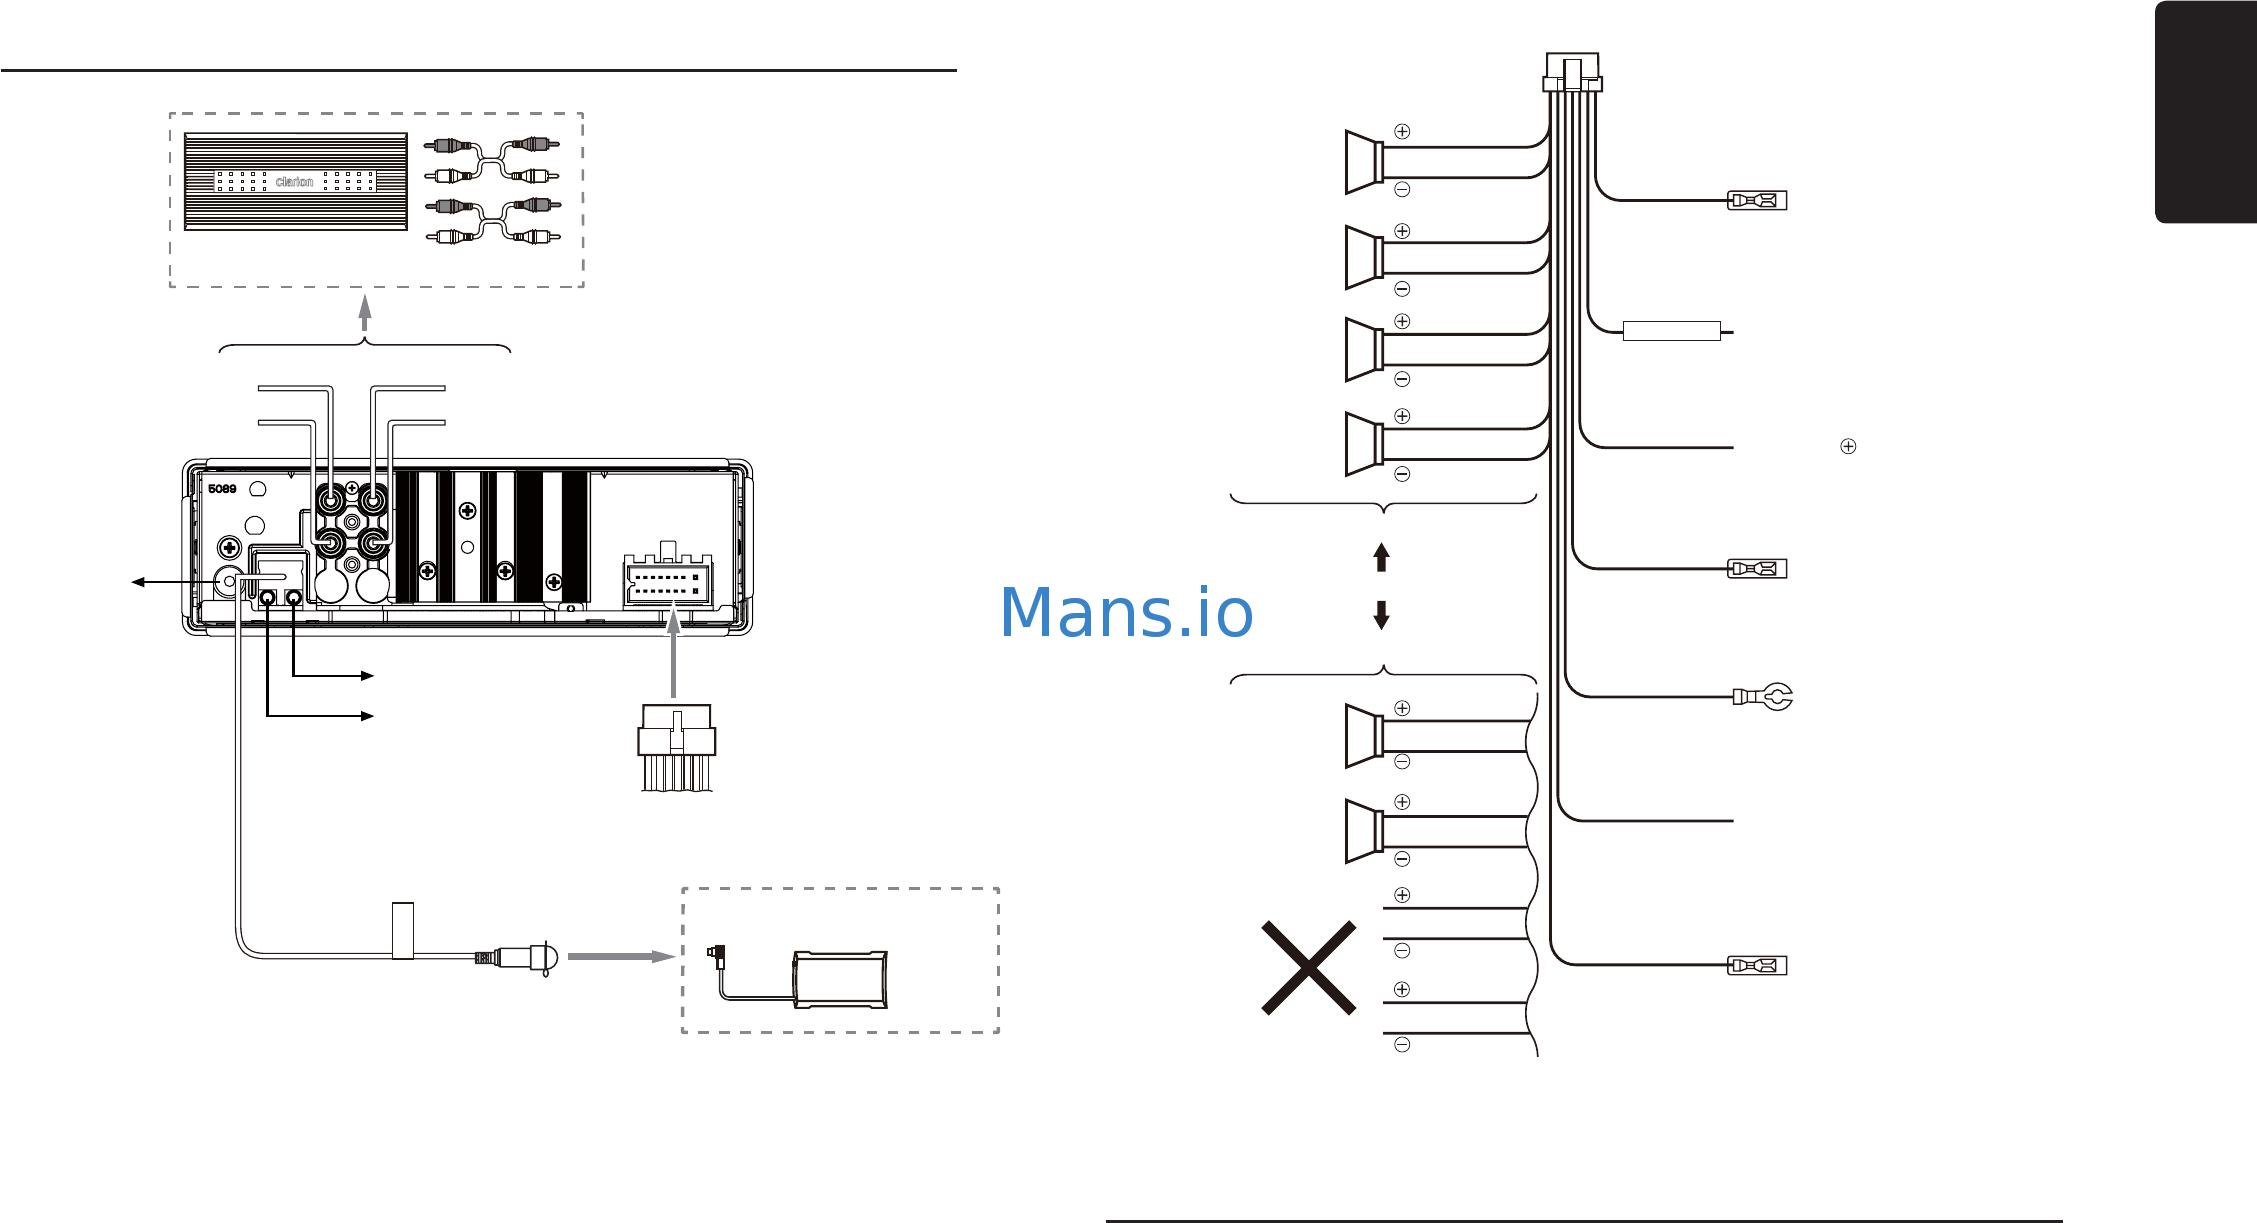 minneapolis moline rtu wiring diagram circuit wiring and diagram hub u2022 rh bdnewsmix com